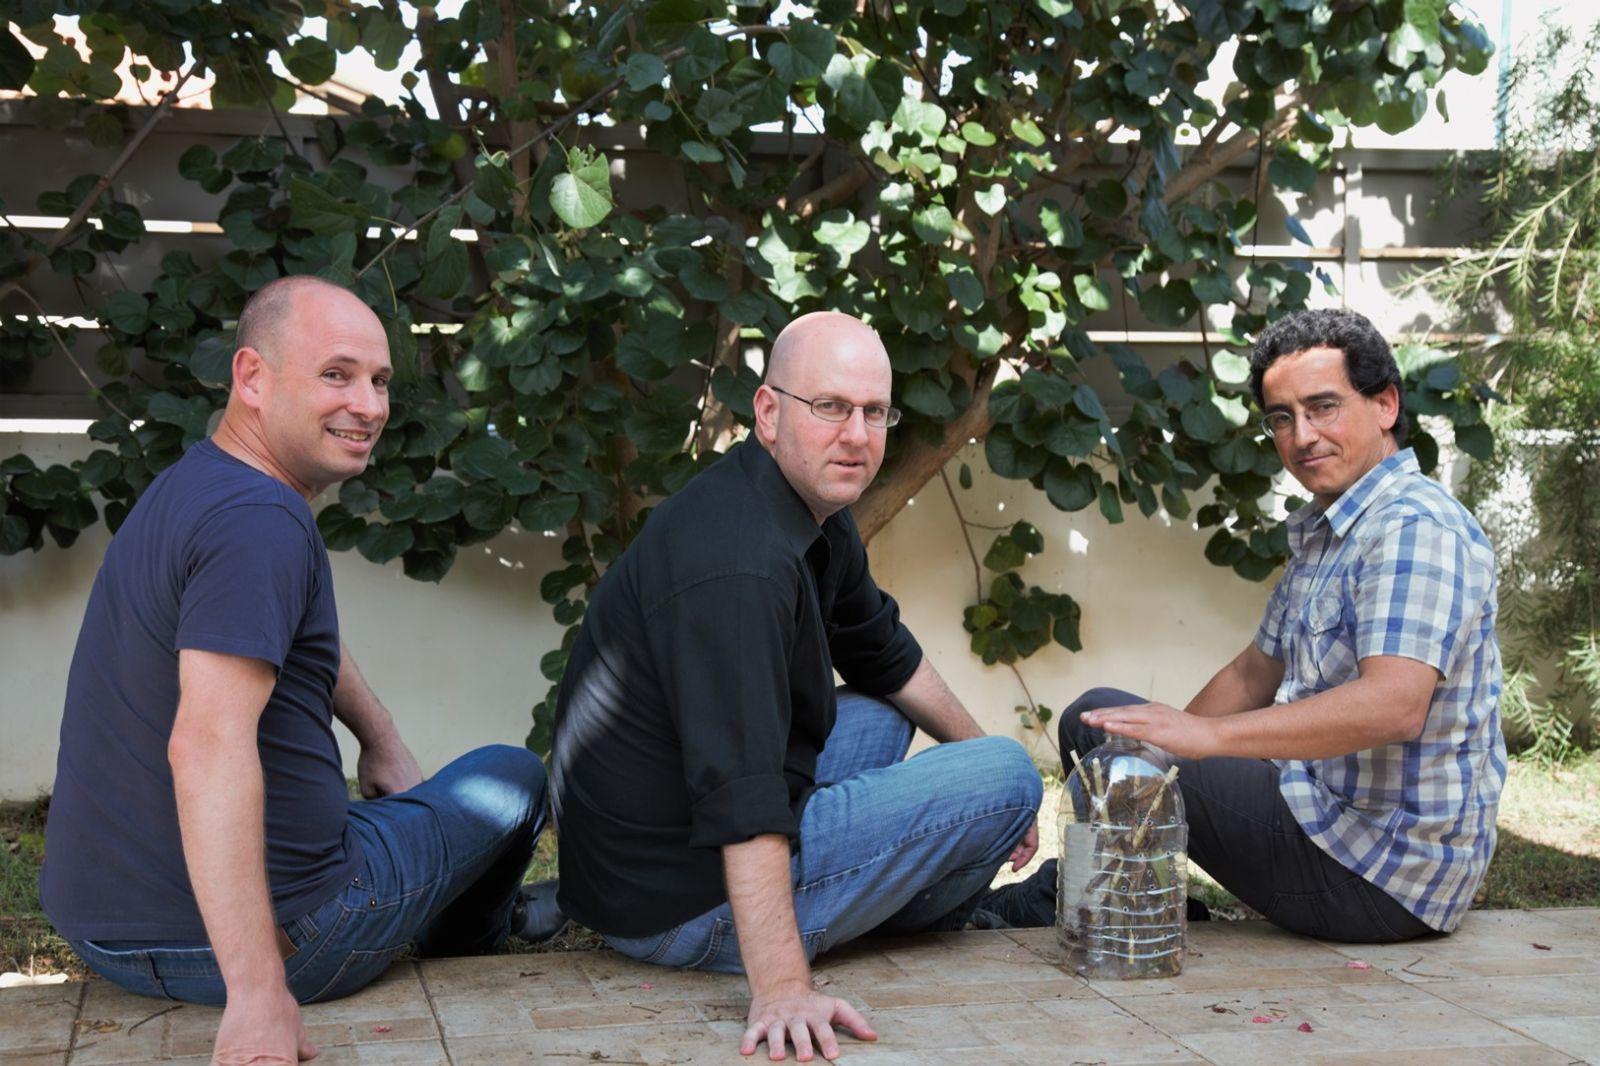 Steak TzarTzar cofounders Dror Tamir, Ben Friedman and Chanan Aviv. Photo by Naor Friedman